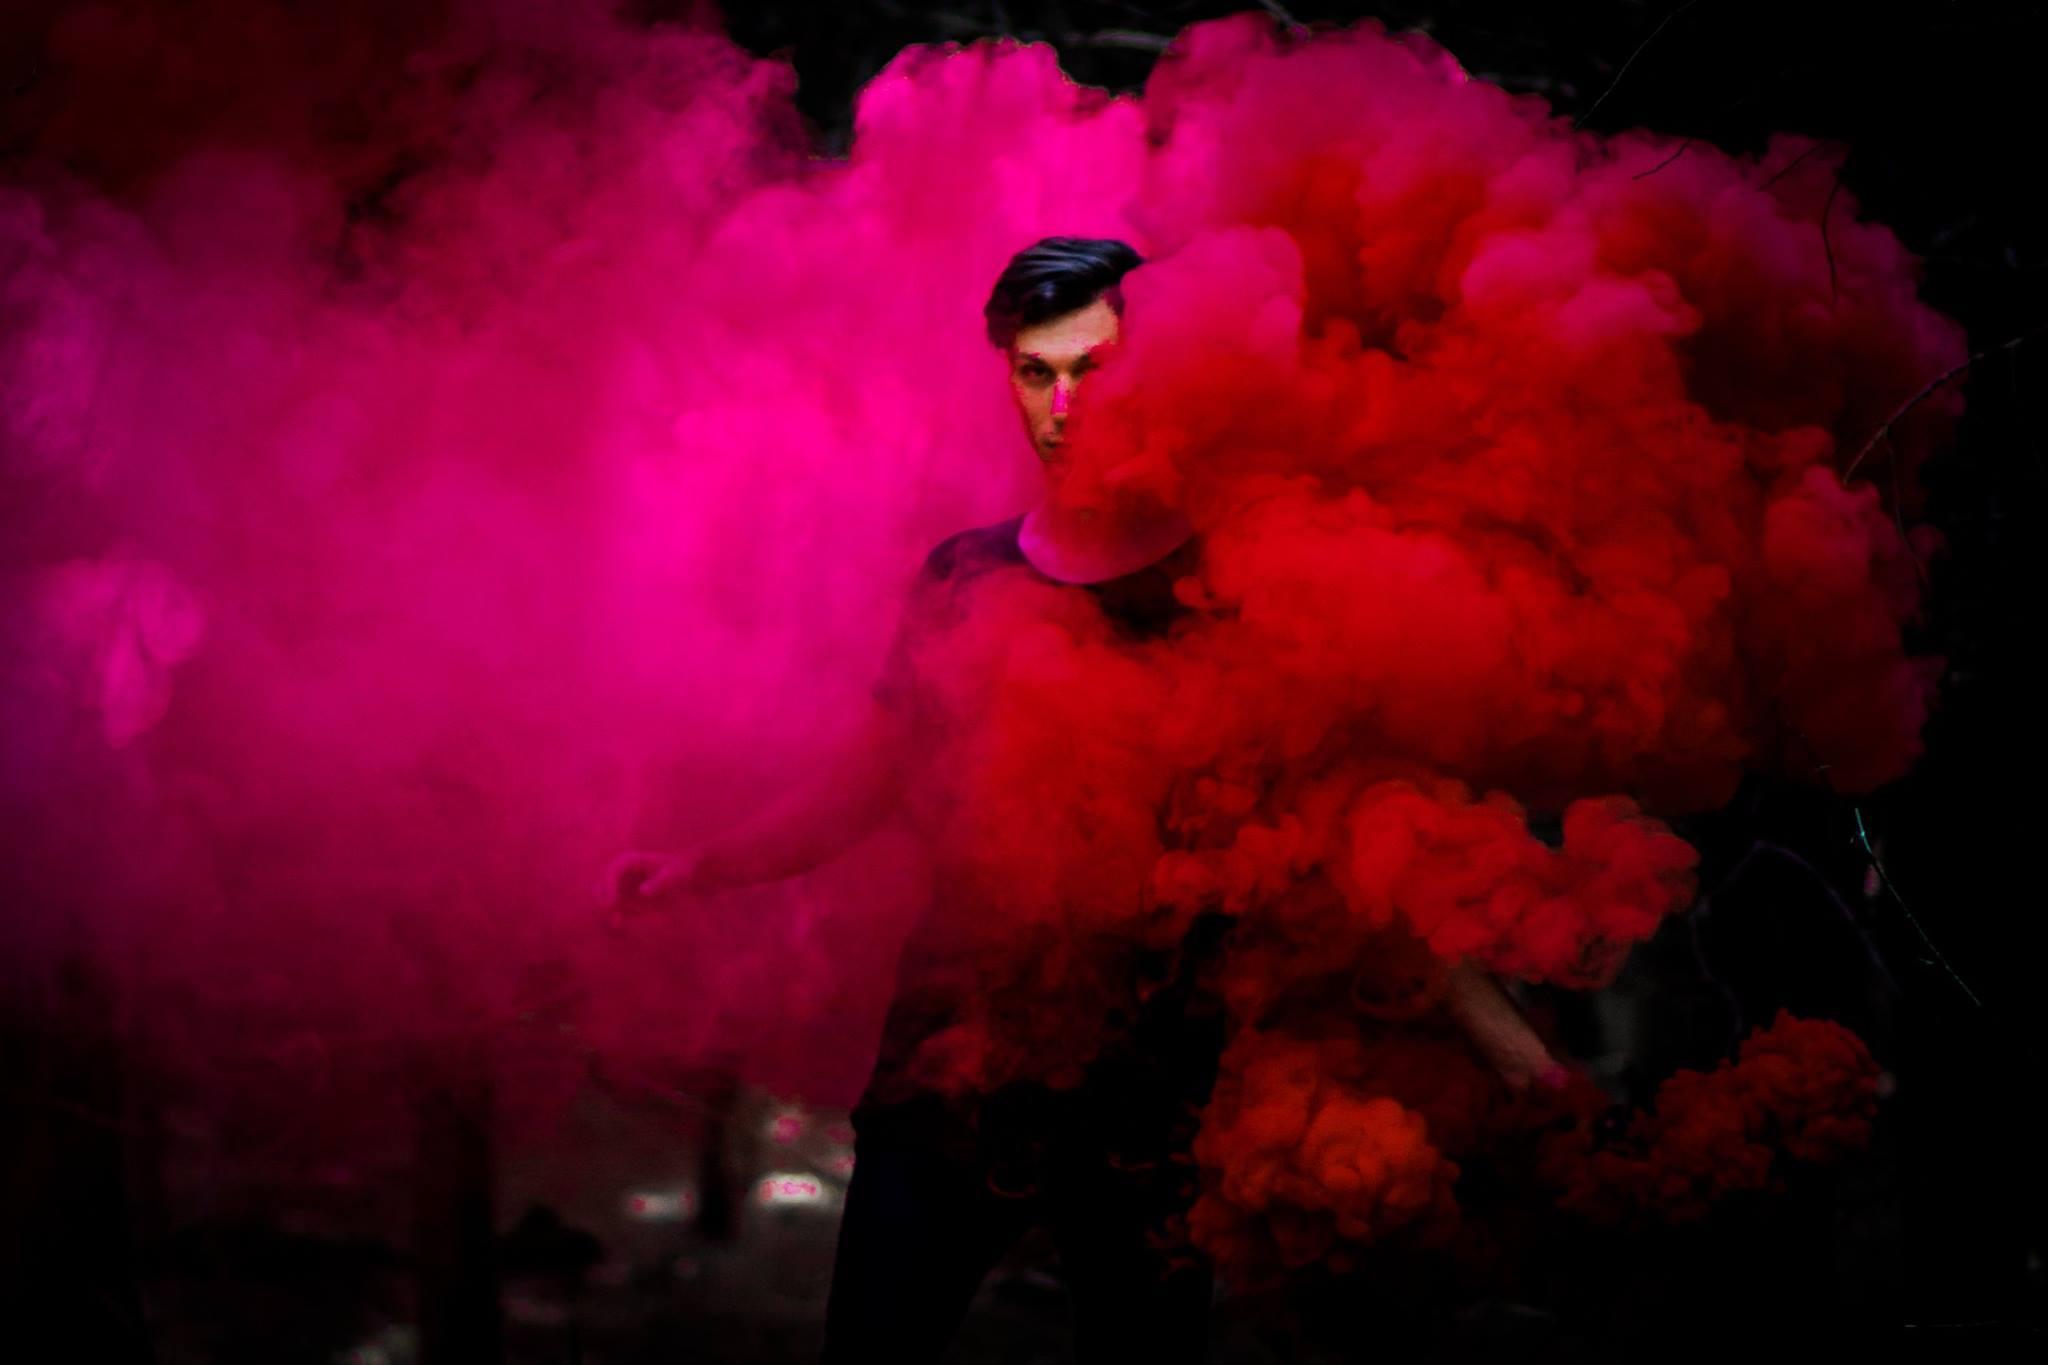 How to Photograph Colored Smoke Bomb Photos | Tutorial | YANI MACUTE